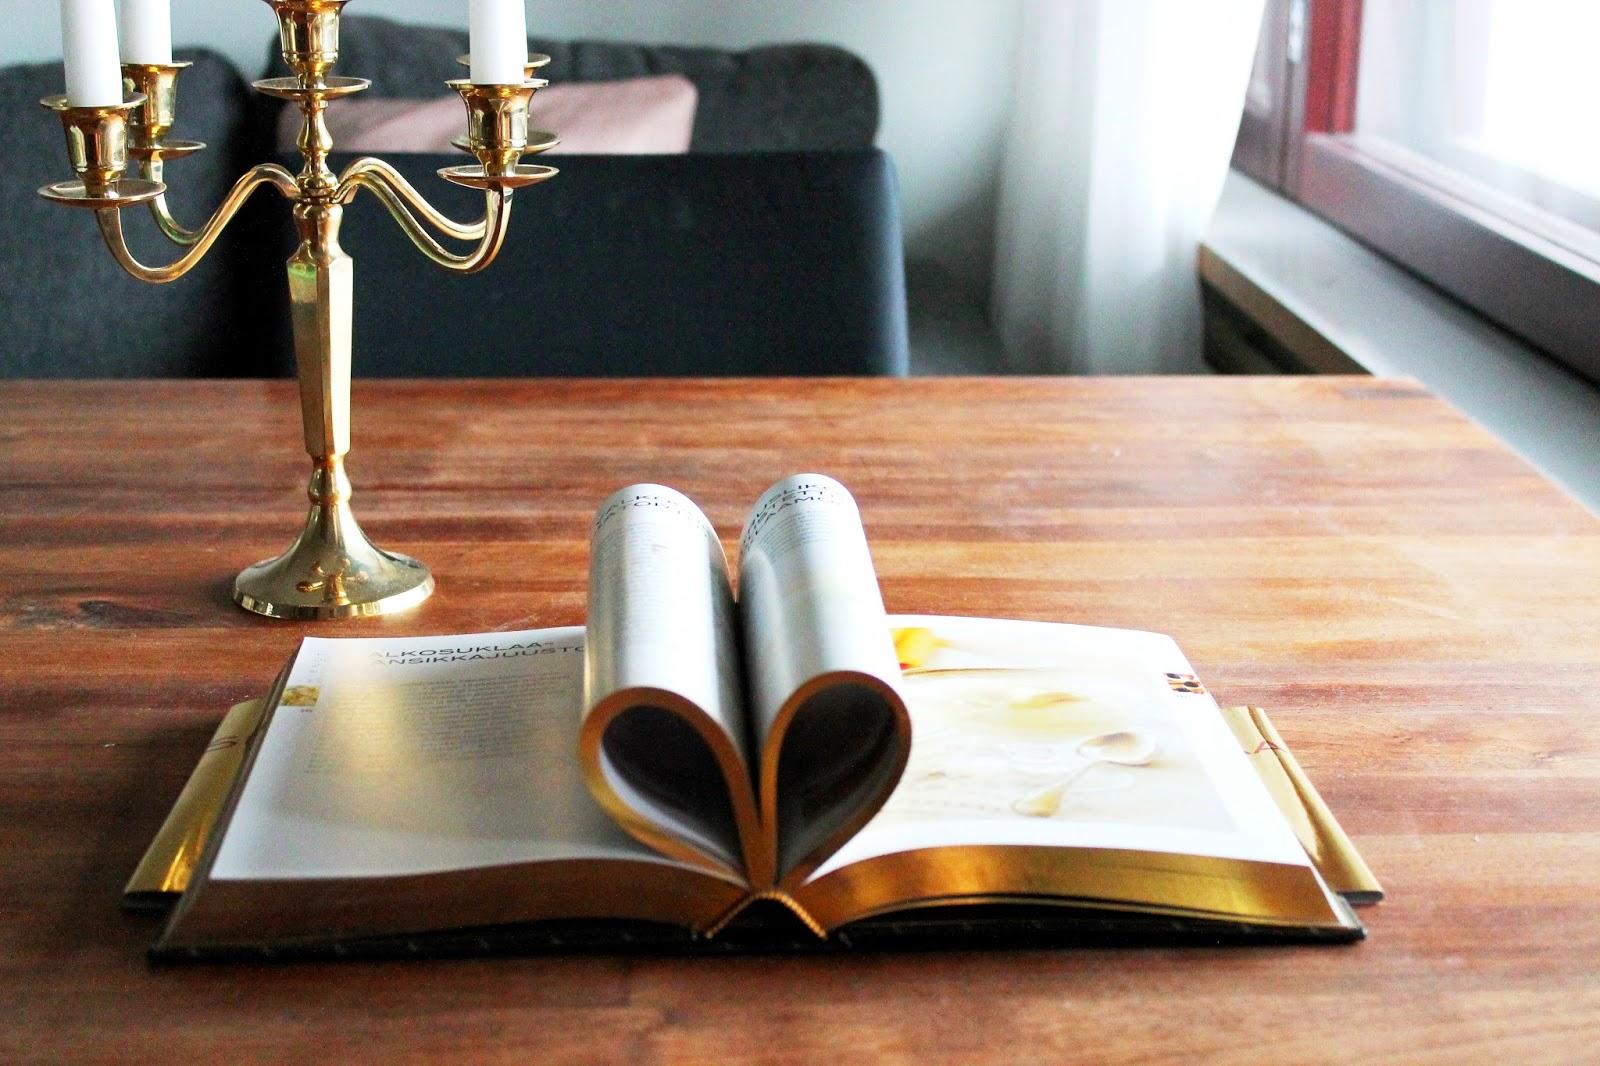 I just luv my Chocolate golden edition recipe bok   Alinan kotona blog #books #booklover #gold #heart